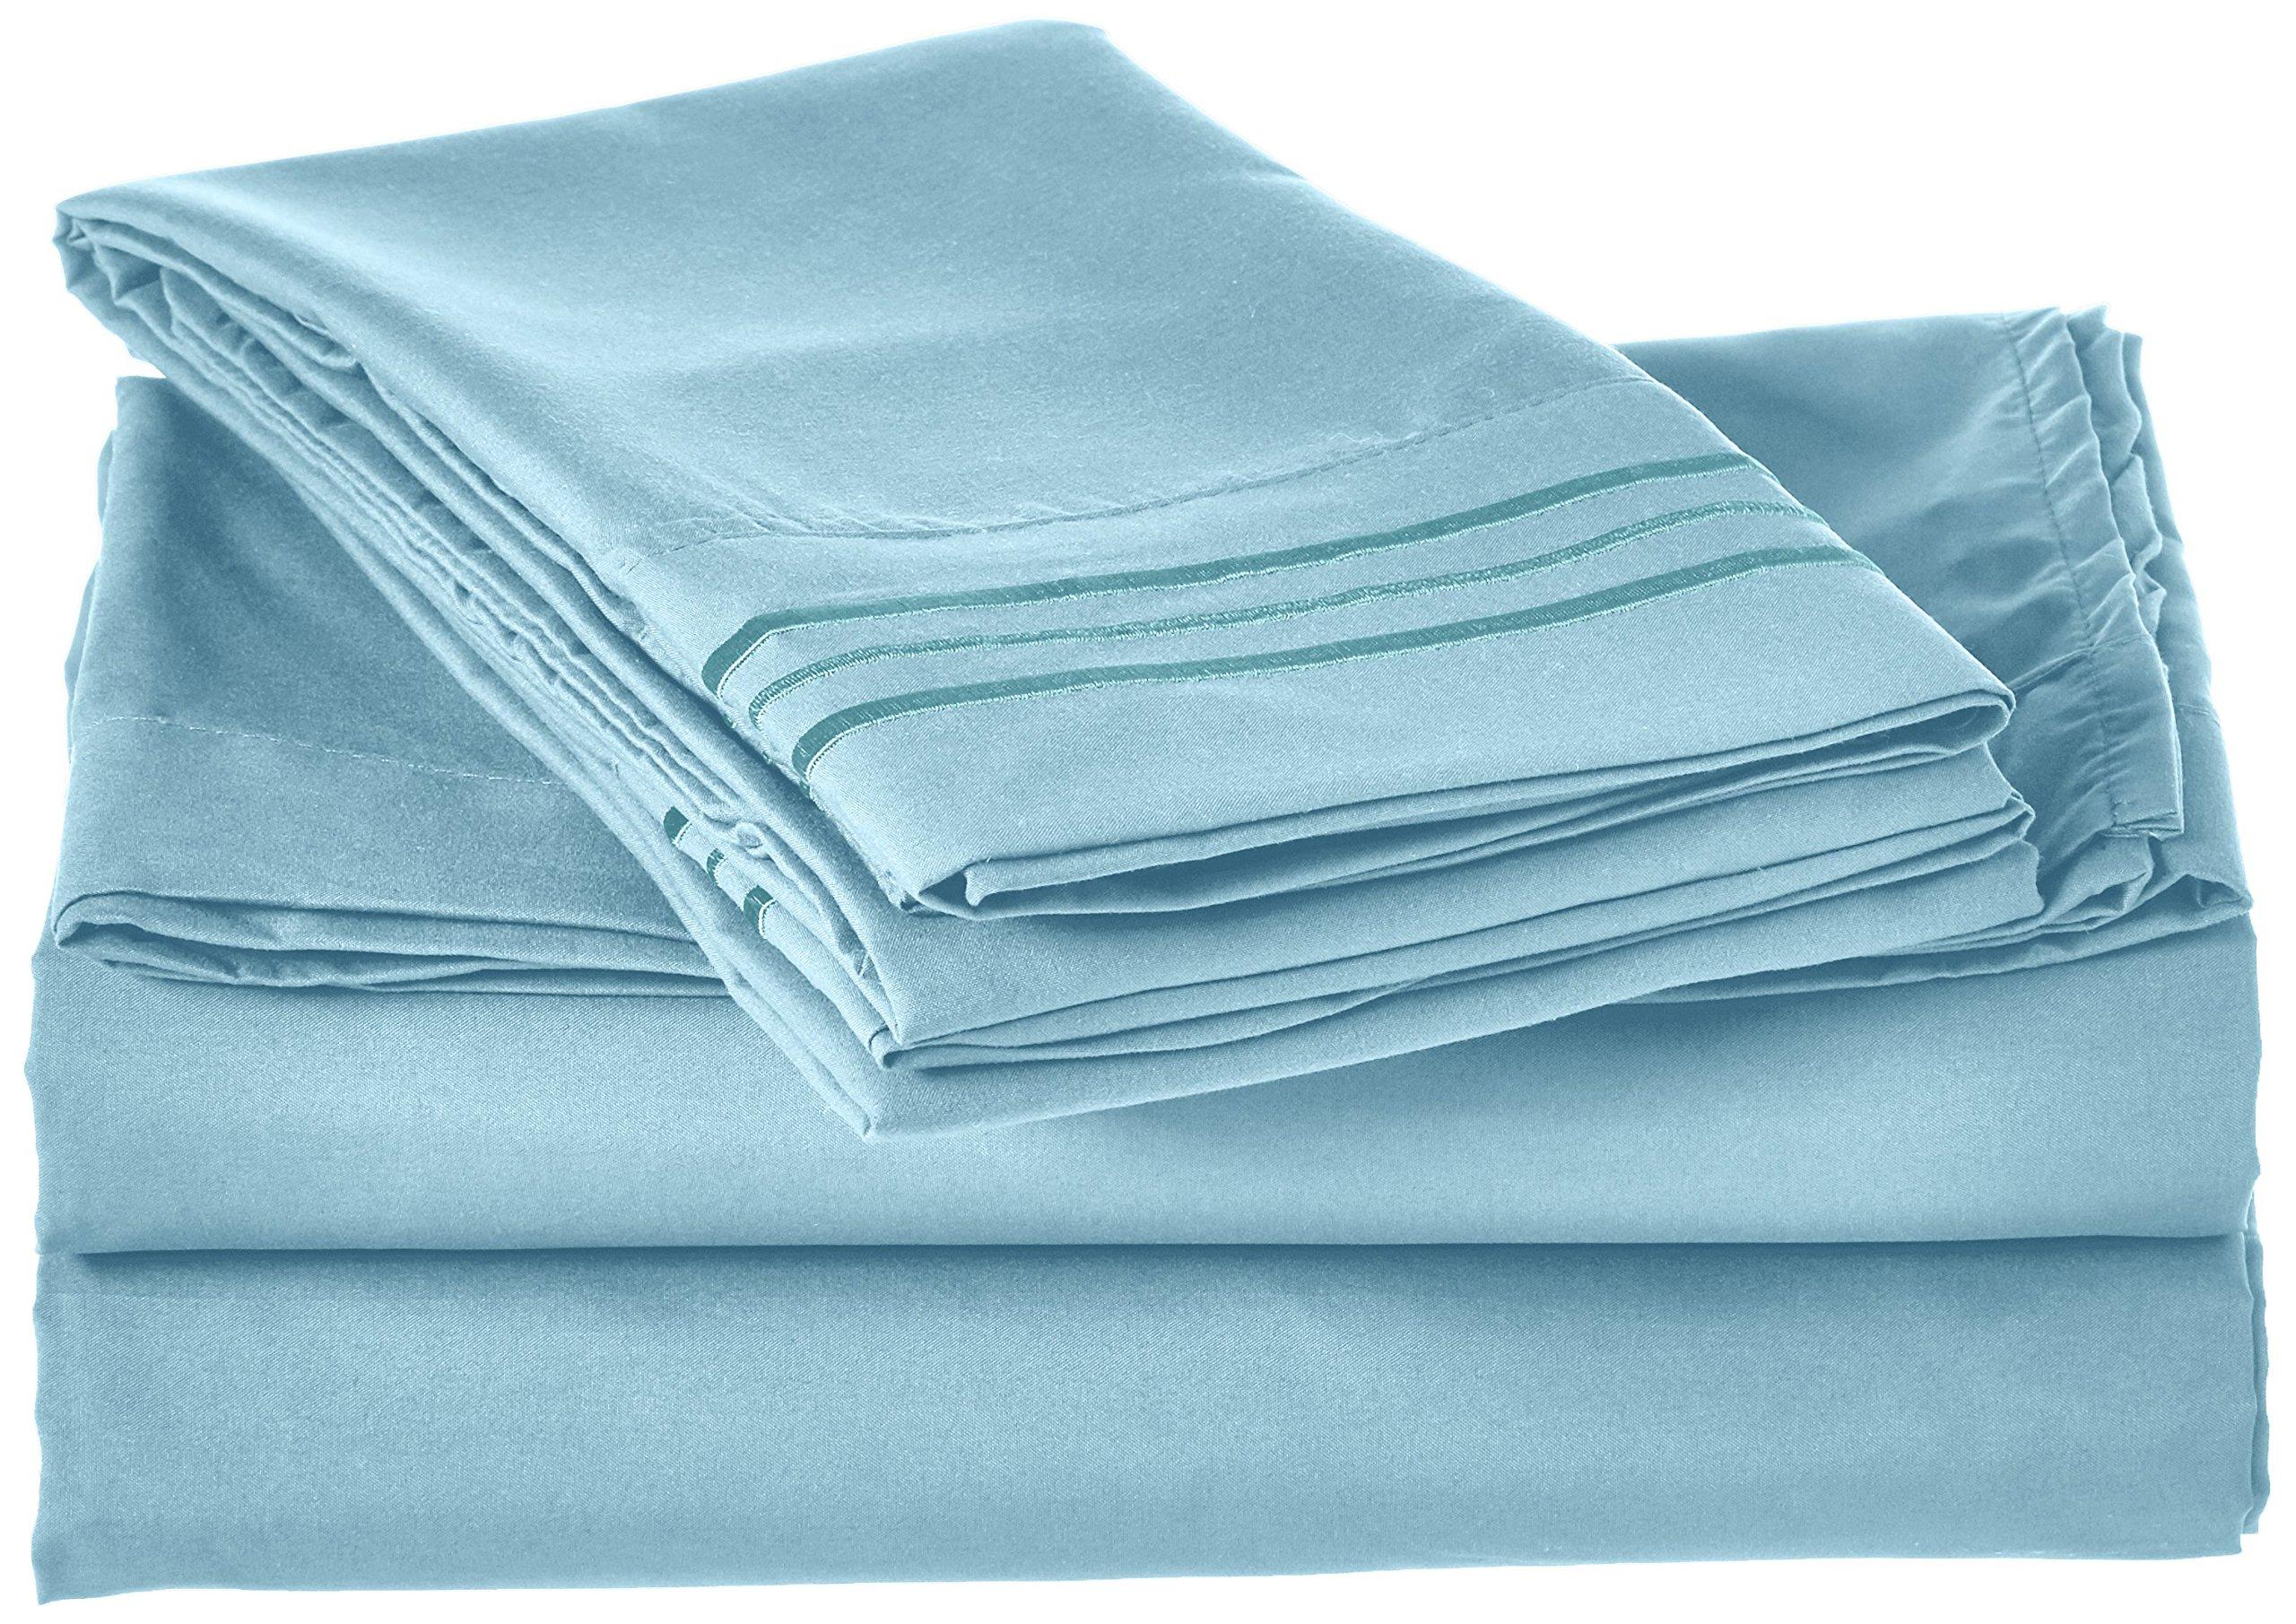 Elegant Comfort 4 件套床单床上用品! 奢华柔软 1500 支埃及品质无皱套深口袋,22 种颜色可选,单人床,普通双人床,大号双人床,加州大号双人床,加州大号双人床 水绿色 Queen 135RW 1500-Queen-Aqua